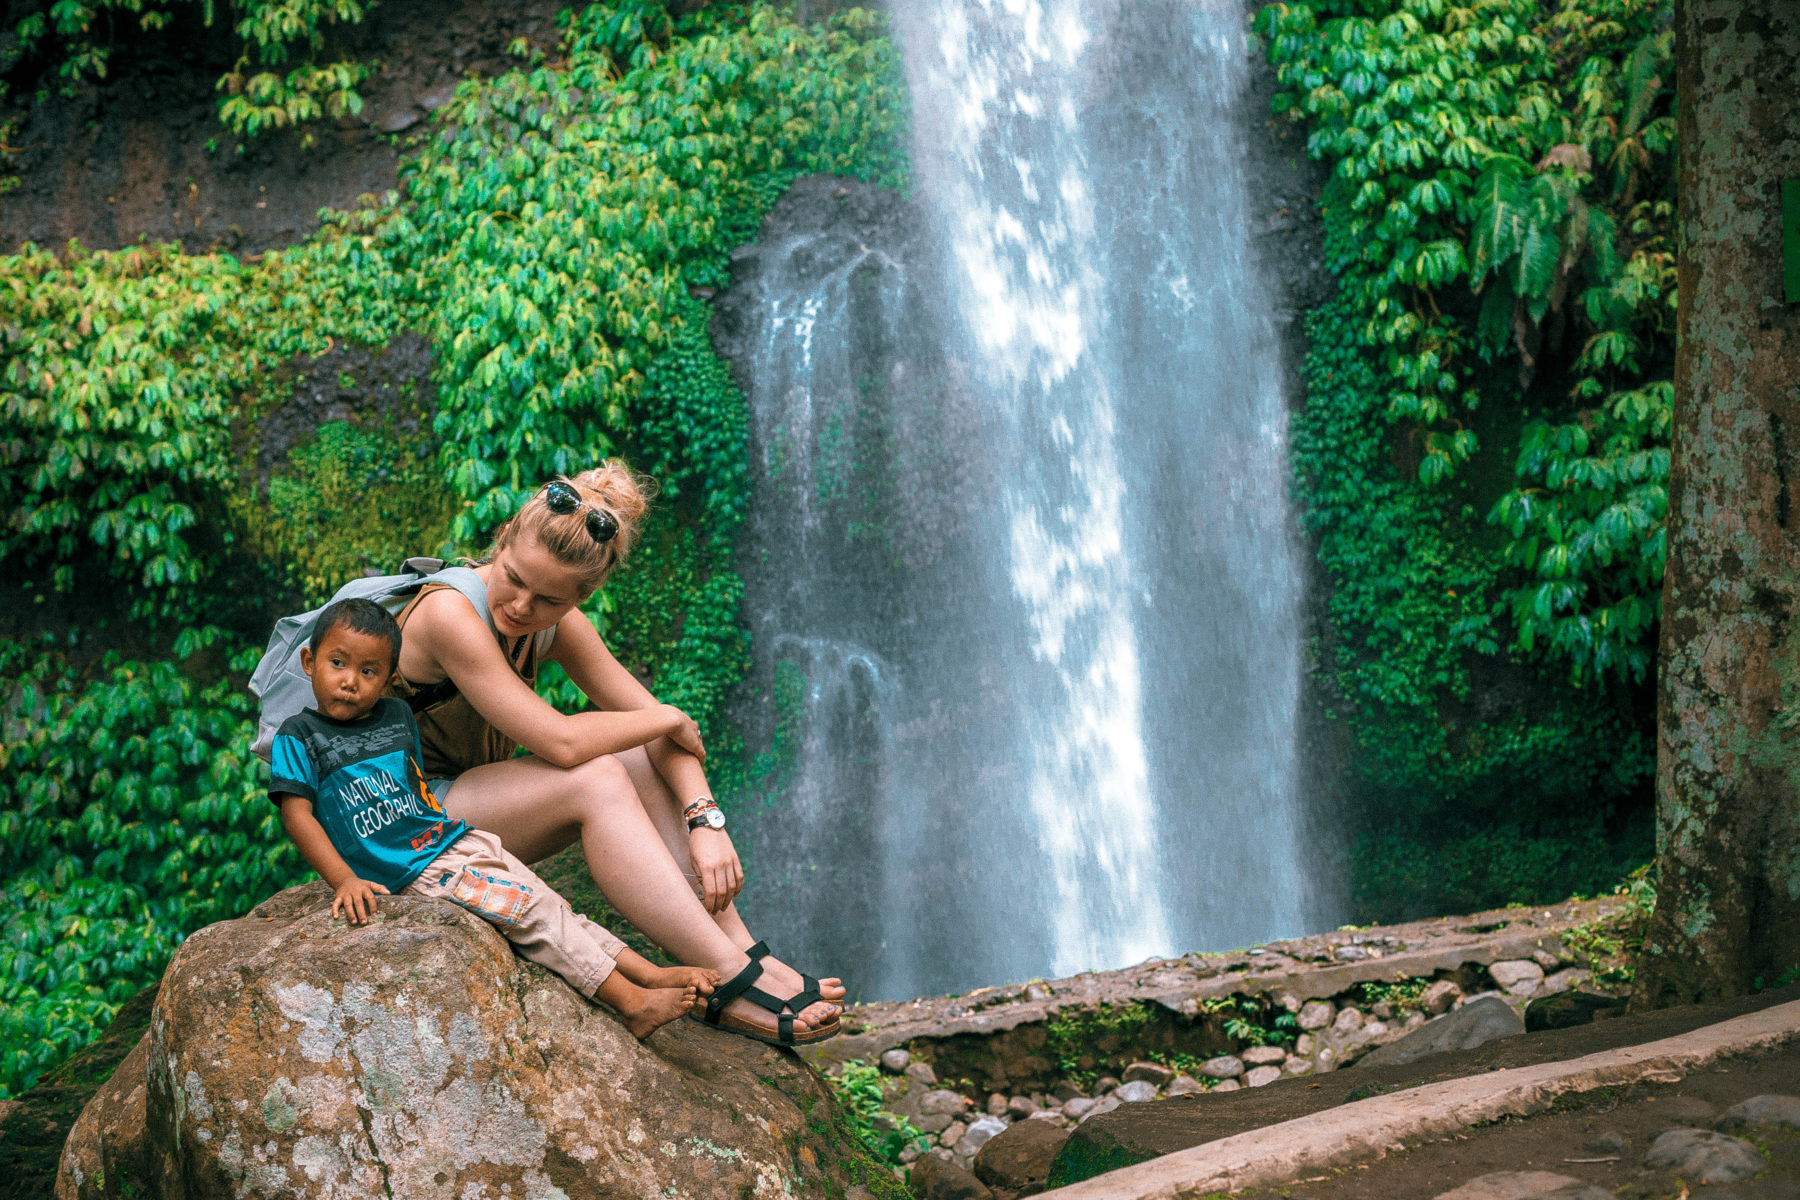 lombok indonesia waterfall green lush jungle exploring traveling local kids